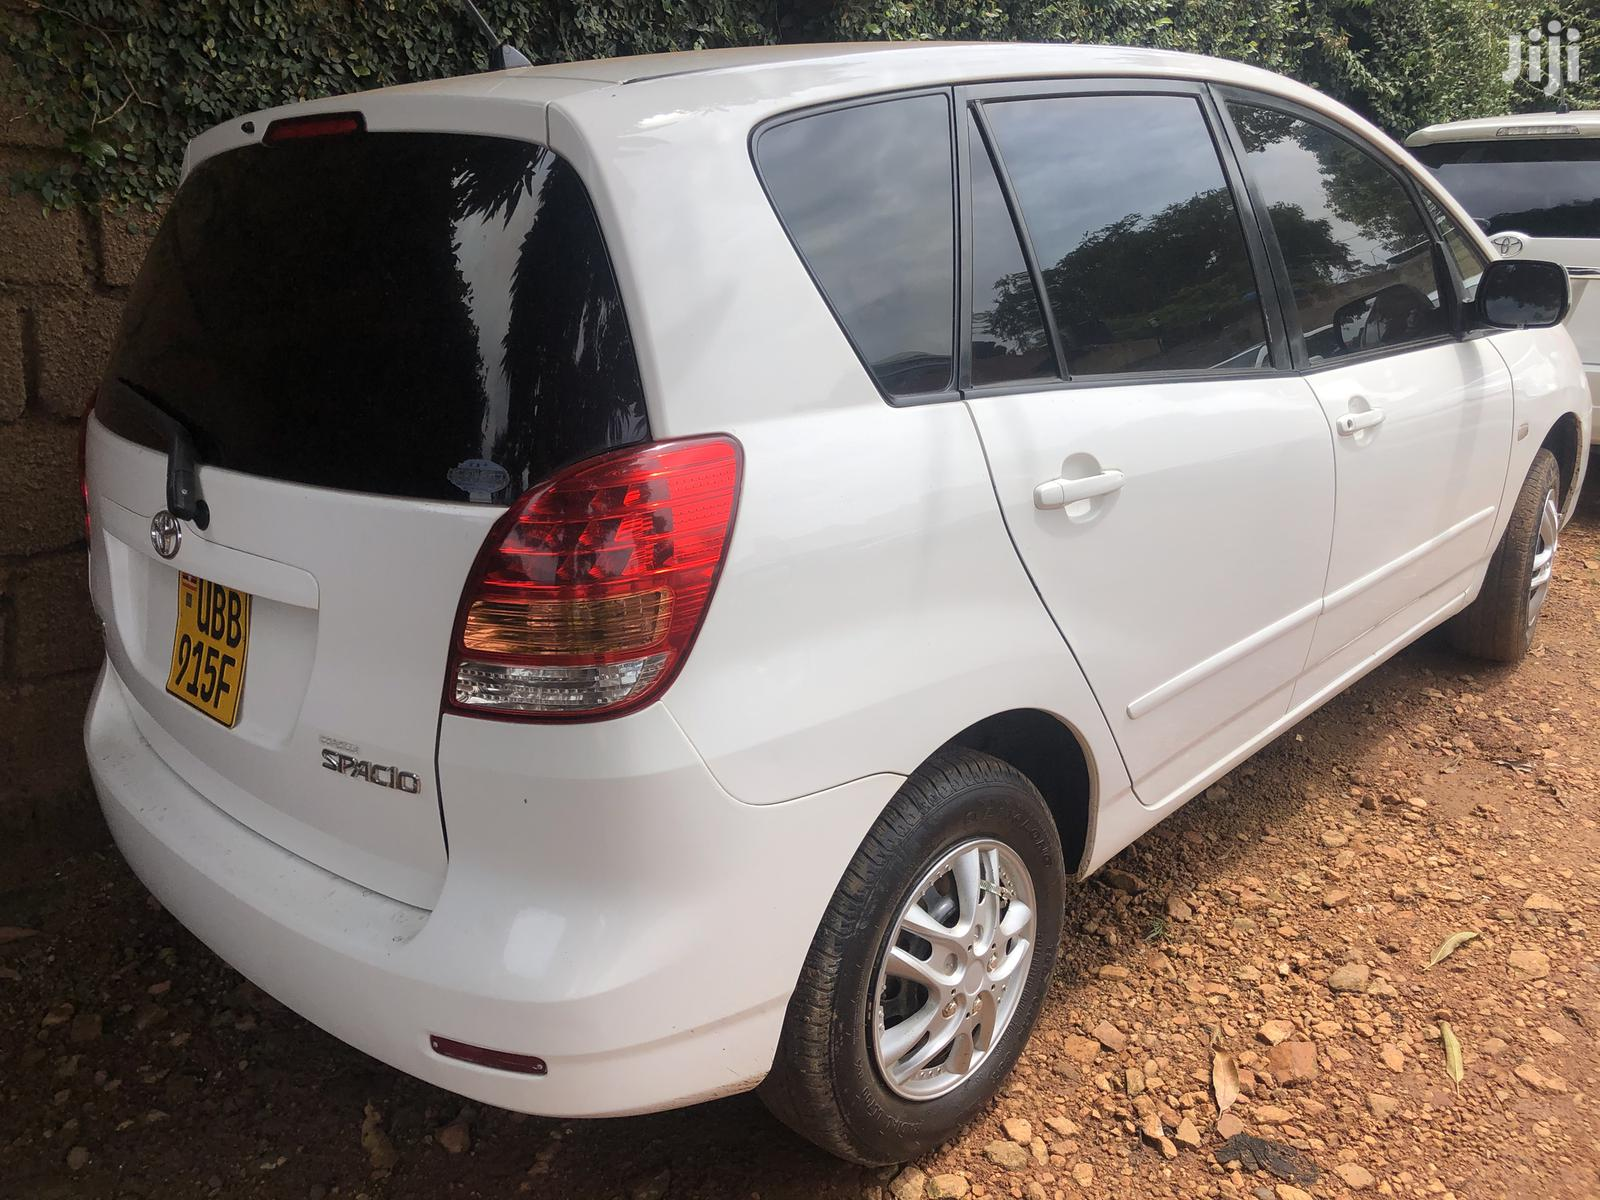 Toyota Spacio 2004 White | Cars for sale in Kampala, Central Region, Uganda